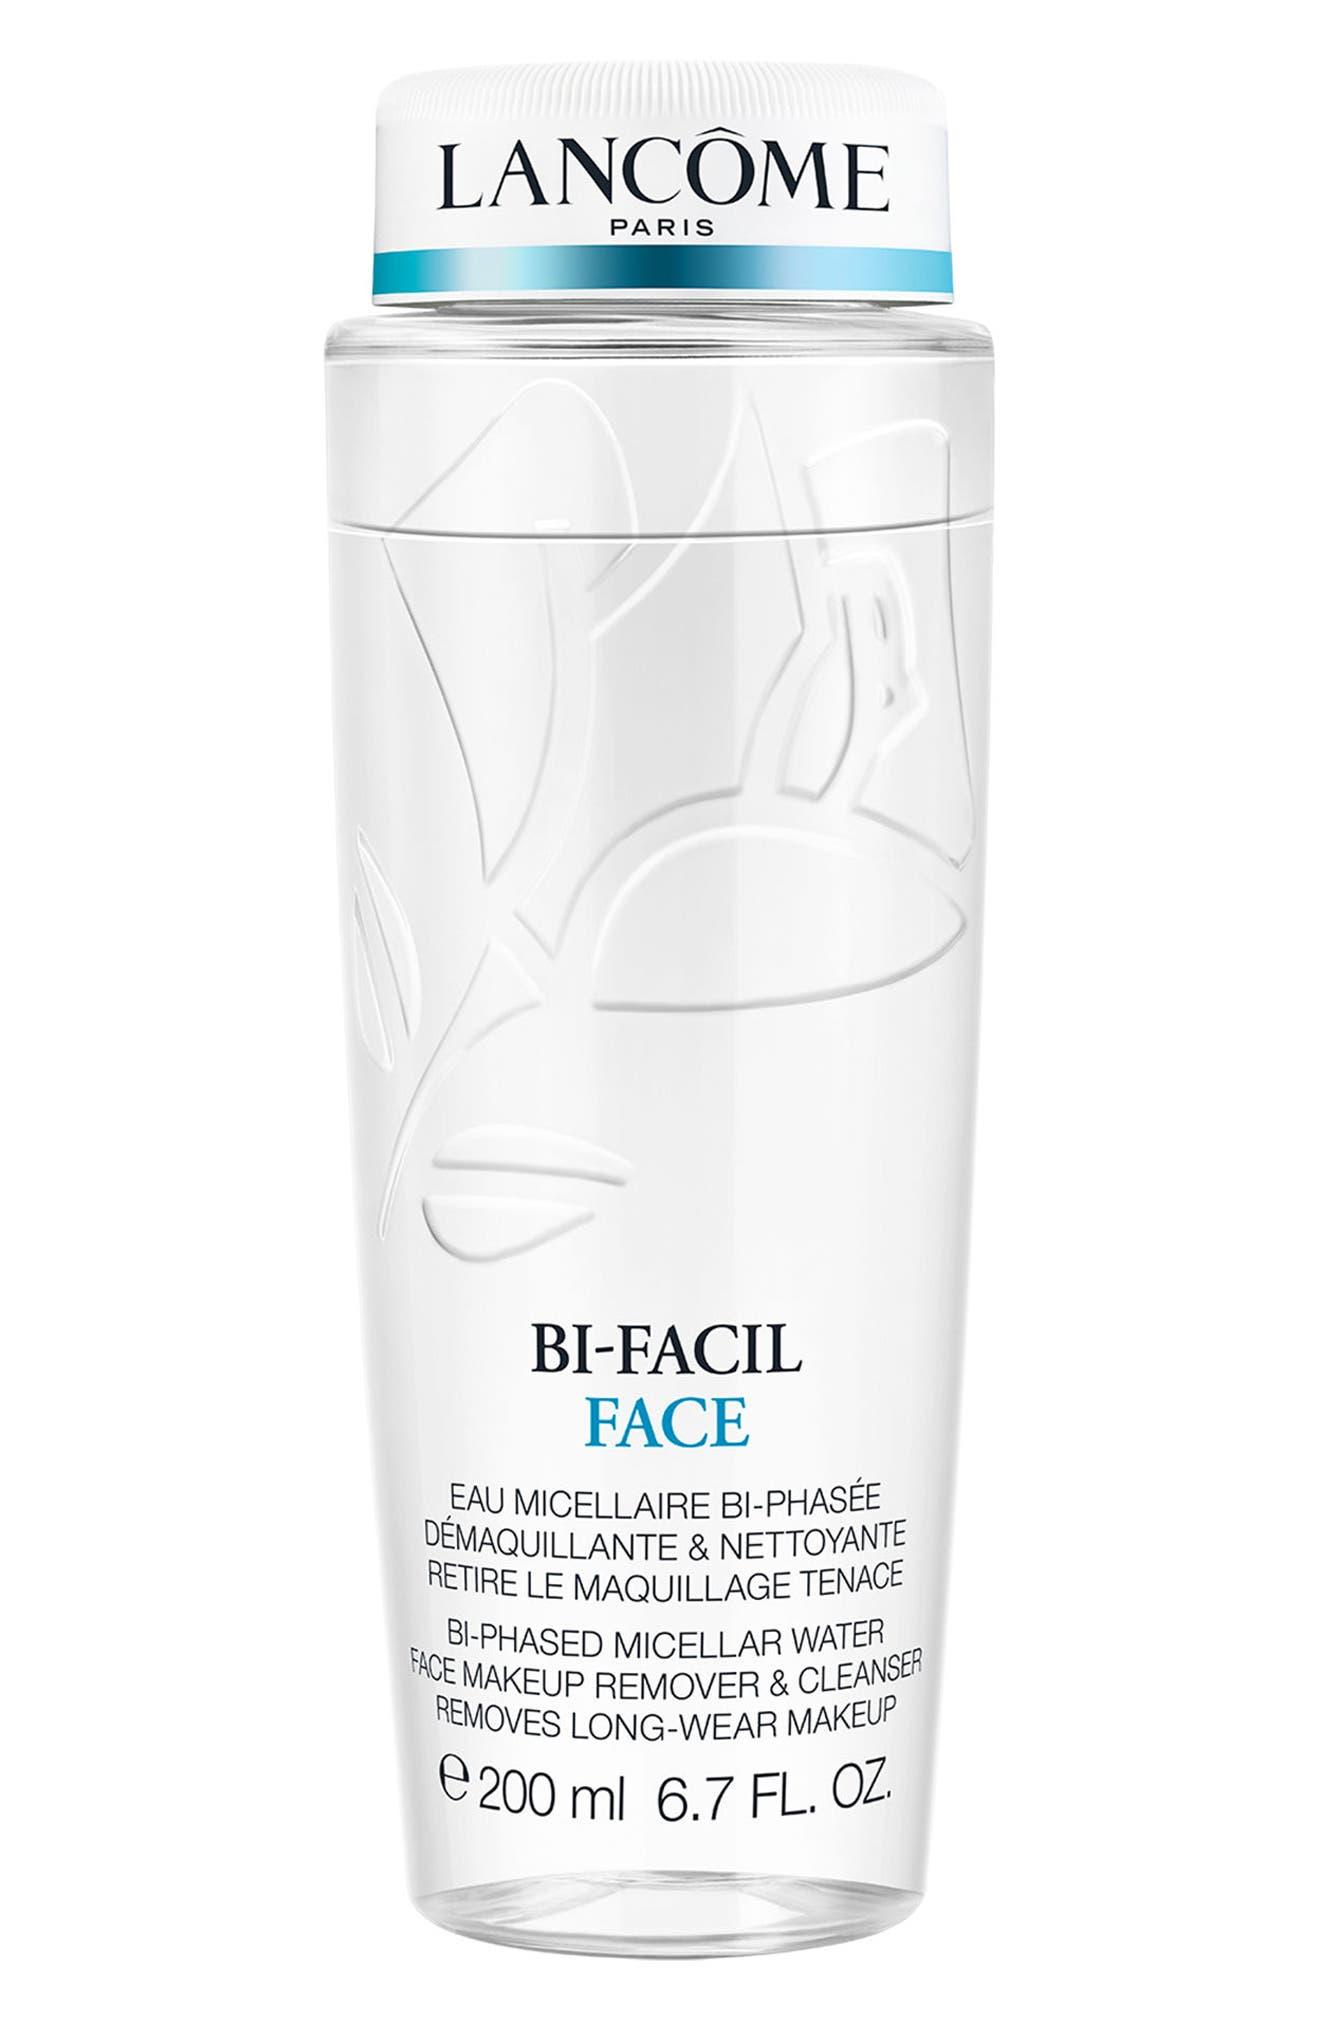 Alternate Image 1 Selected - Lancôme Bi-Facil Face Bi-Phased Micellar Water